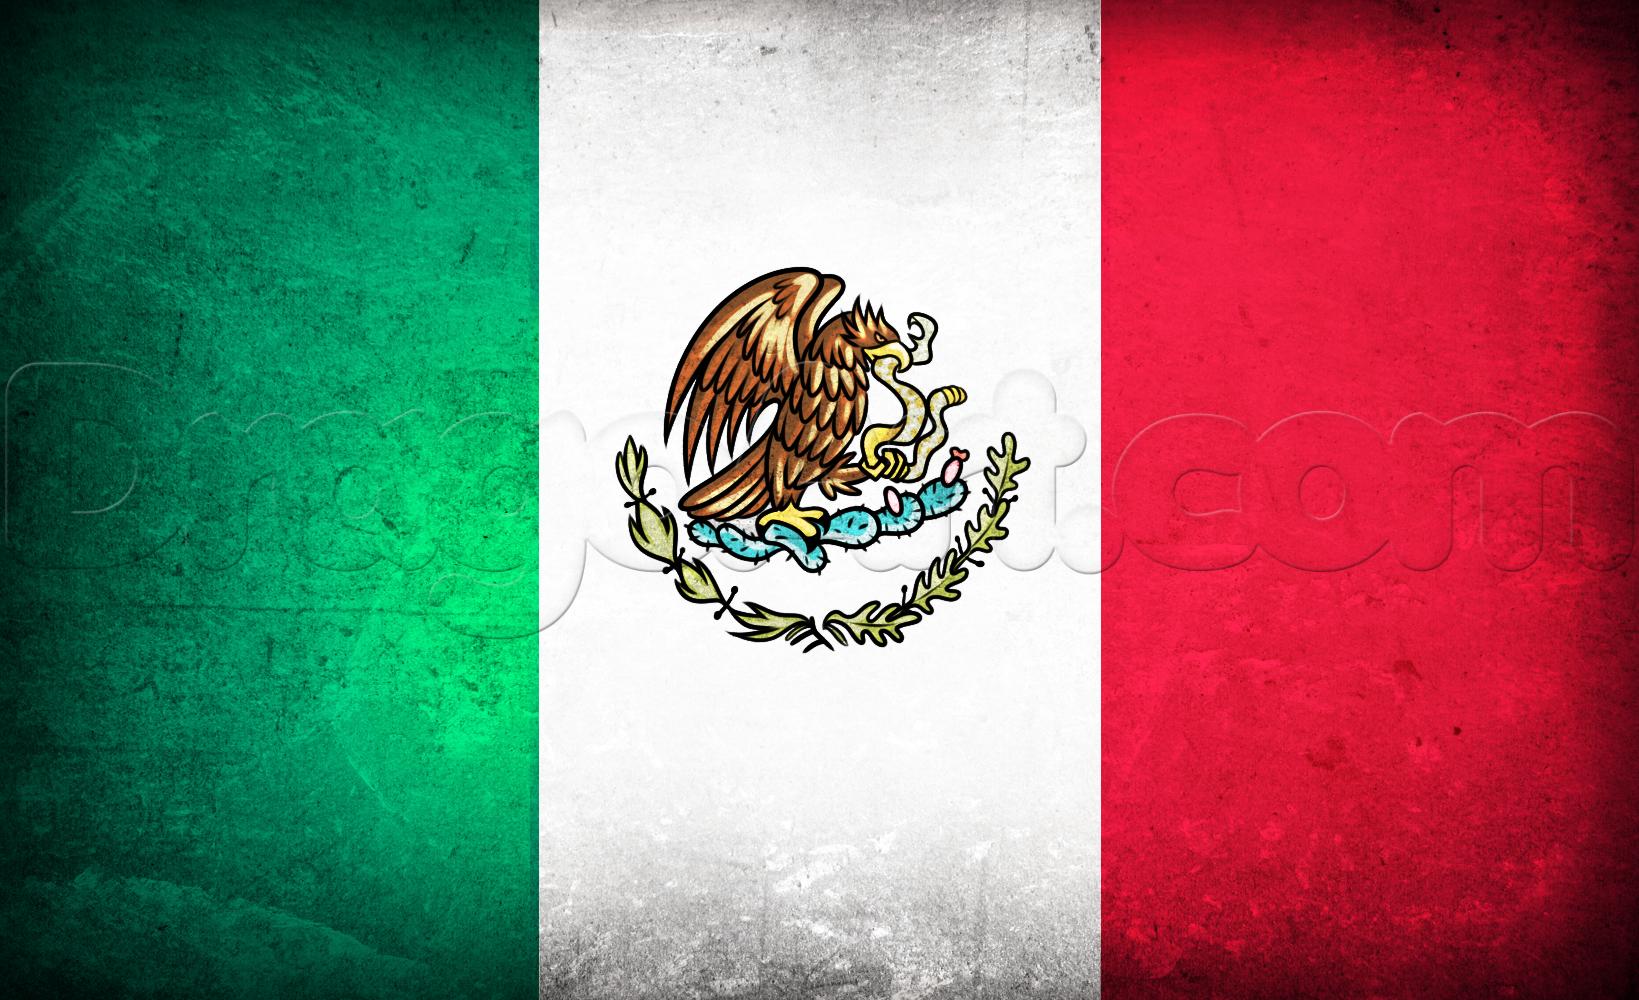 Mexico Flag HD Wallpaper Background Image Viva Mexico Mexico 1639x1000